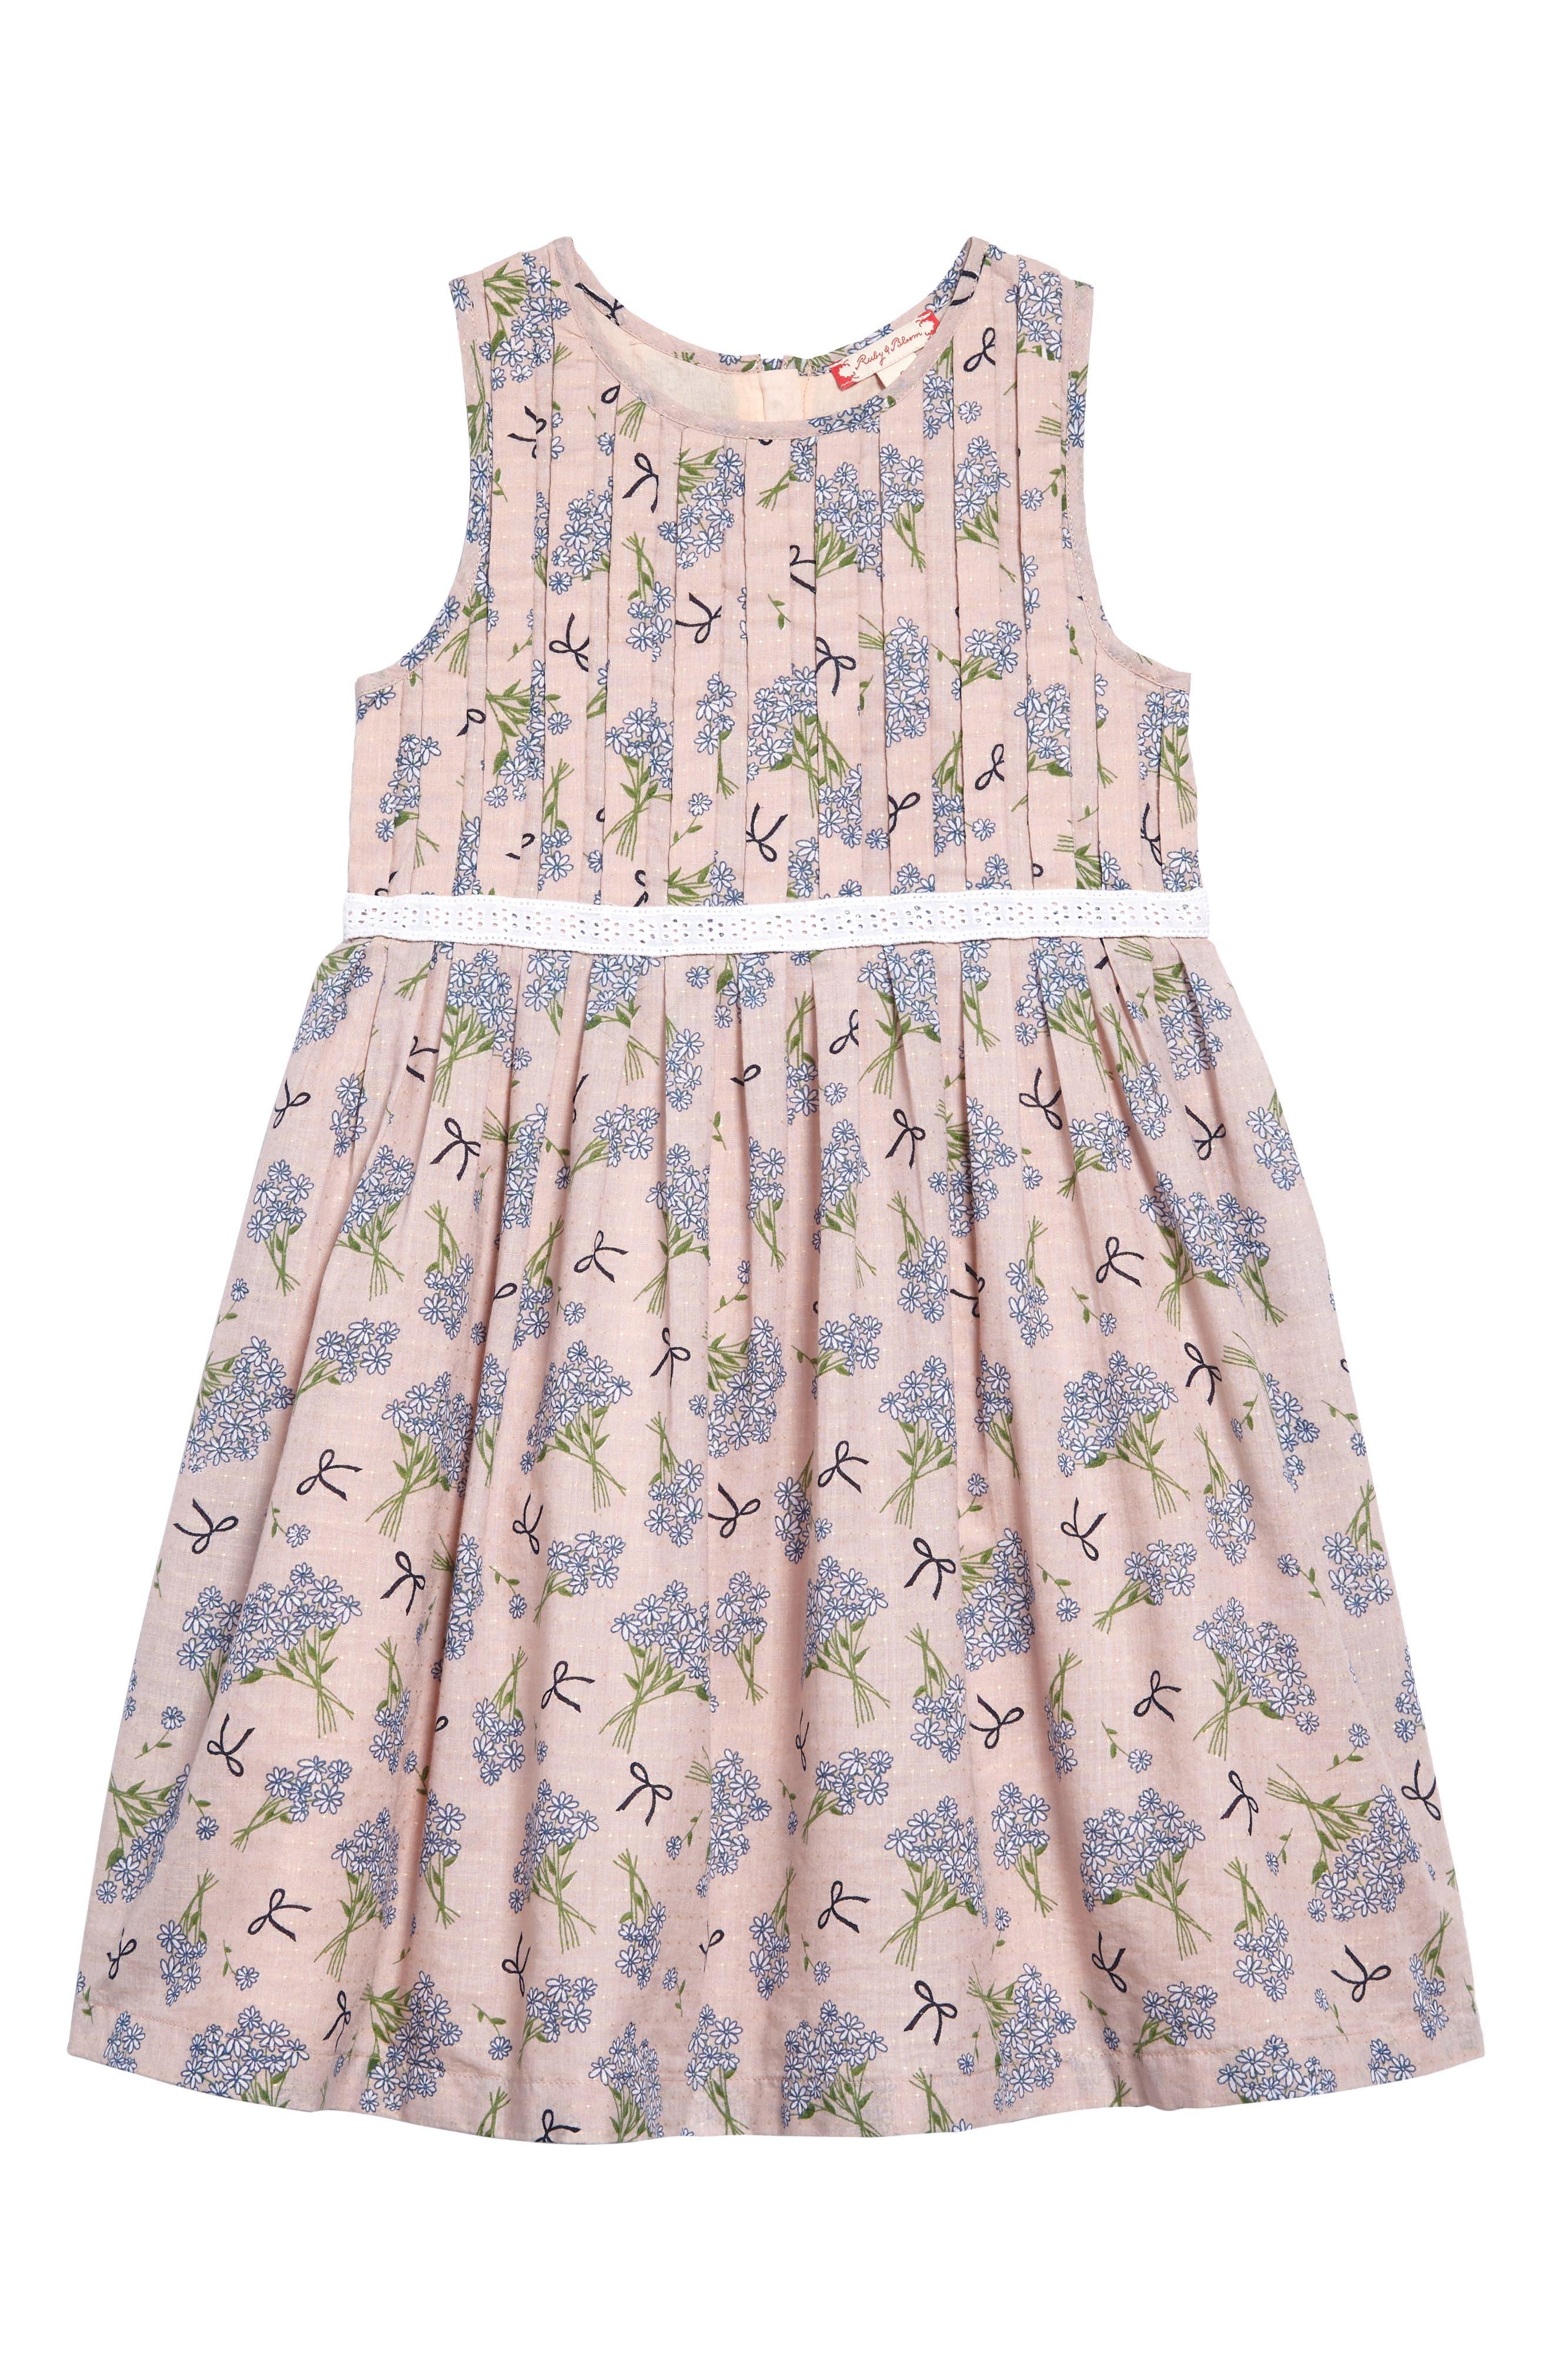 Main Image - Ruby & Bloom Dobby Floral Pleat Dress (Toddler Girls, Little Girls & Big Girls)